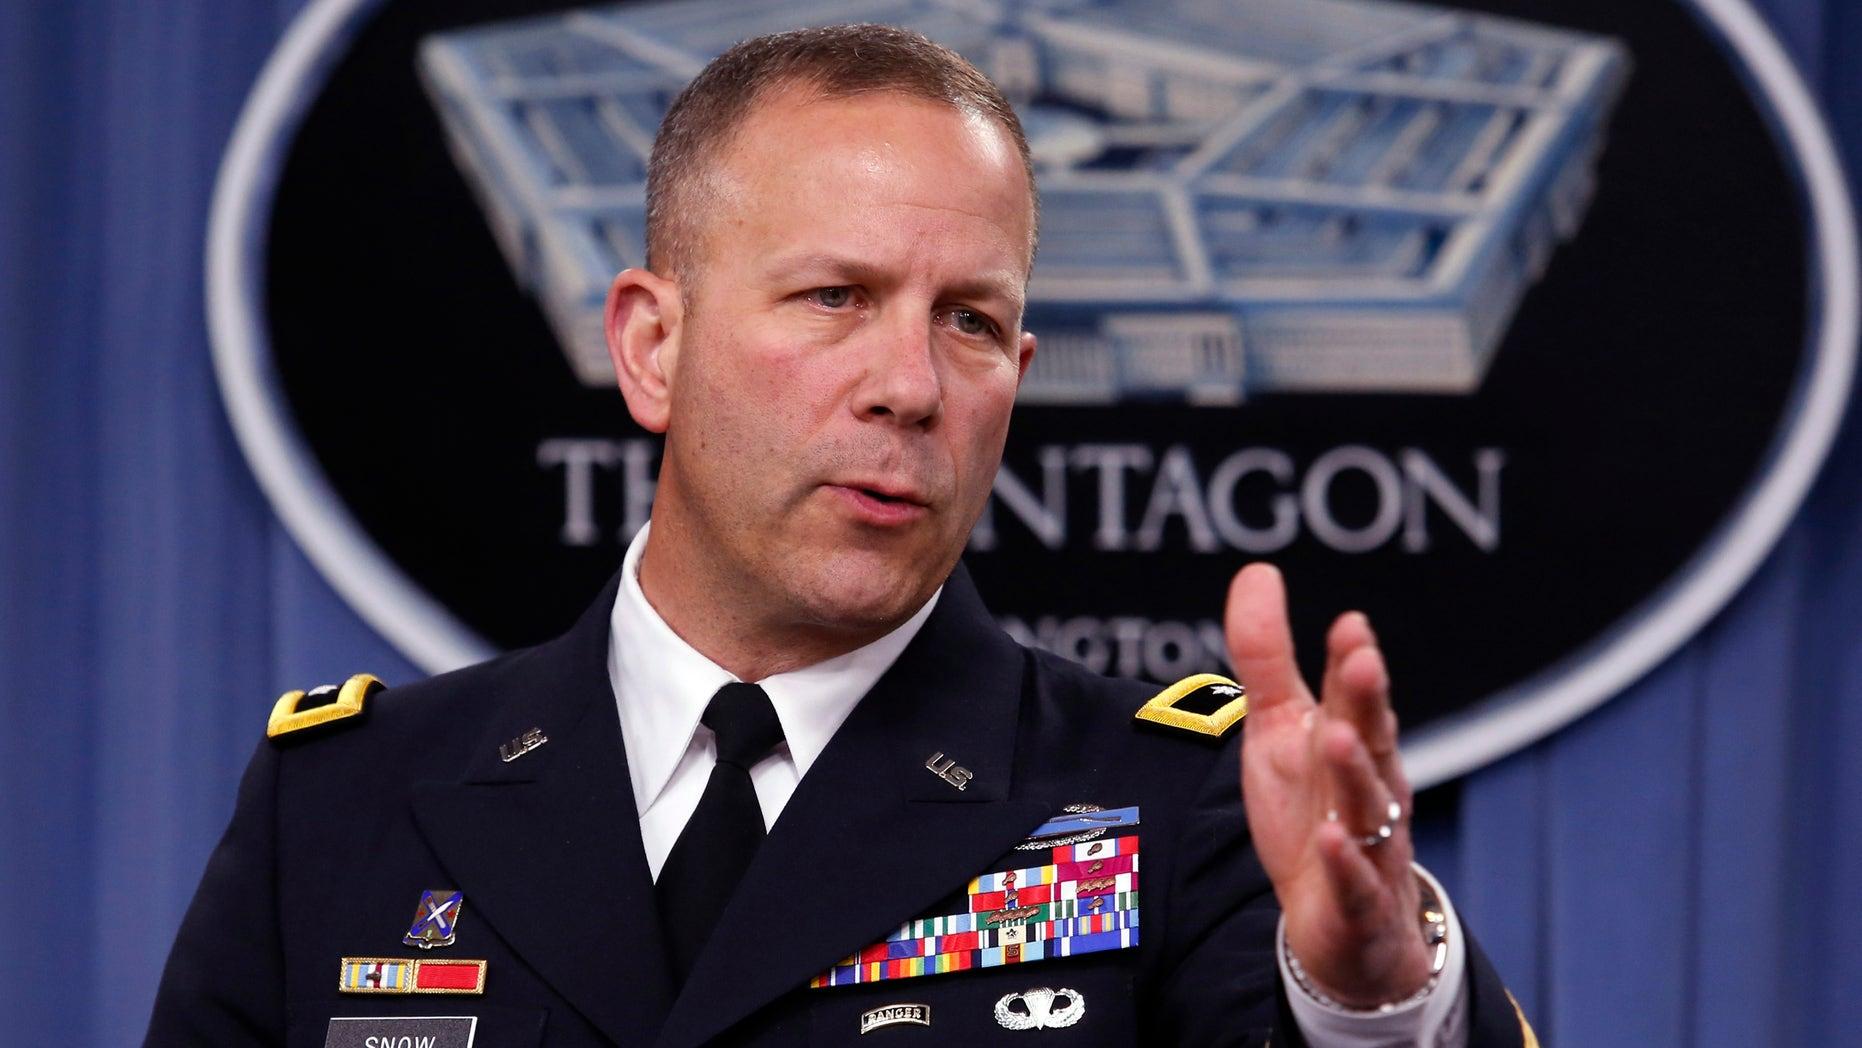 May 1, 2014: U.S. Army Maj. Gen. Jeffrey Snow speaks during a press briefing